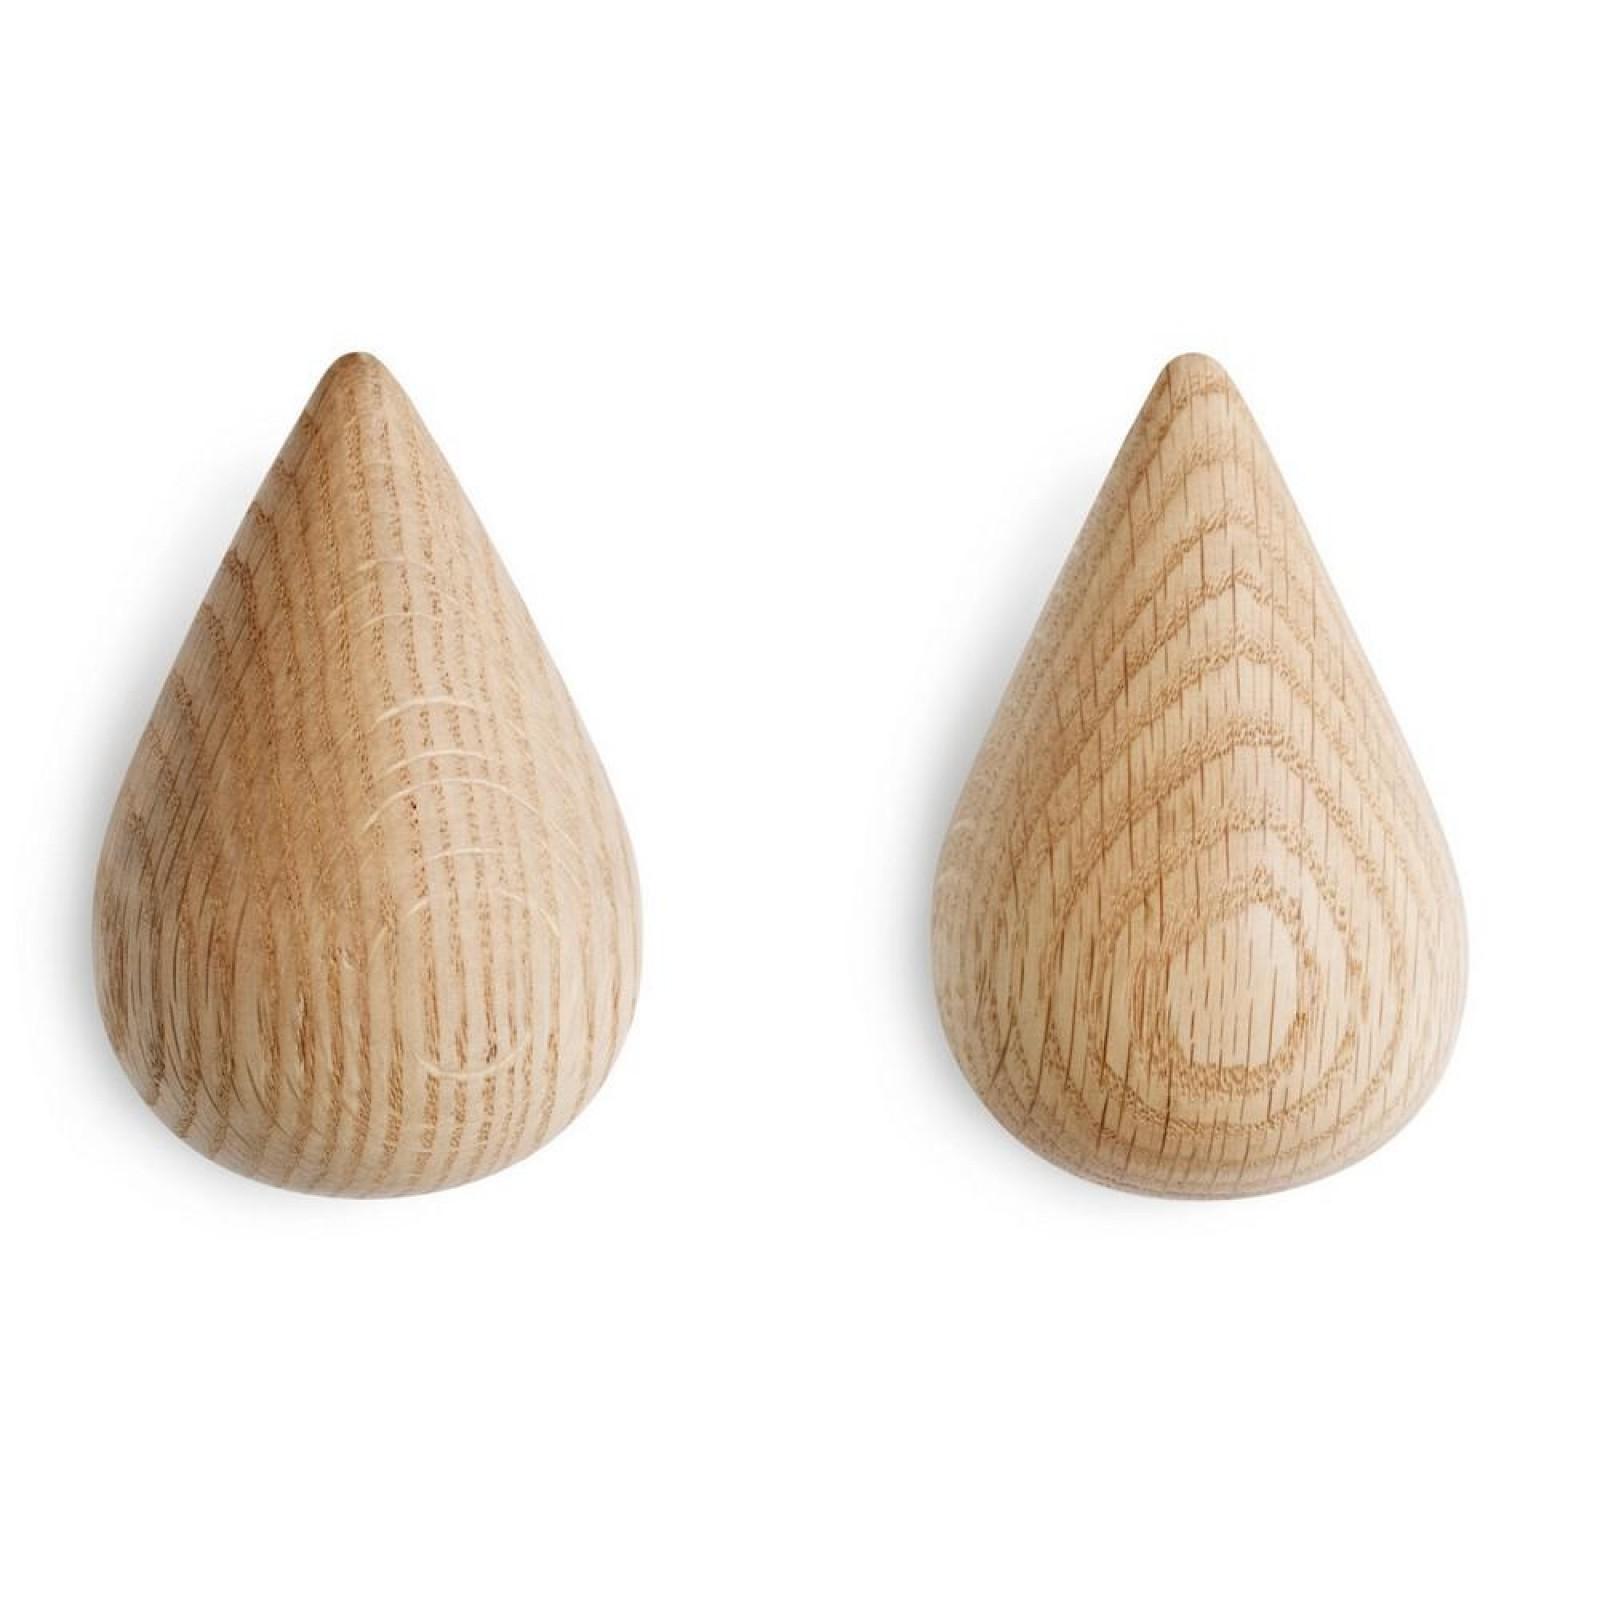 Dropit Large Hook Set of 2 (Natural Wood) - Normann Copenhagen